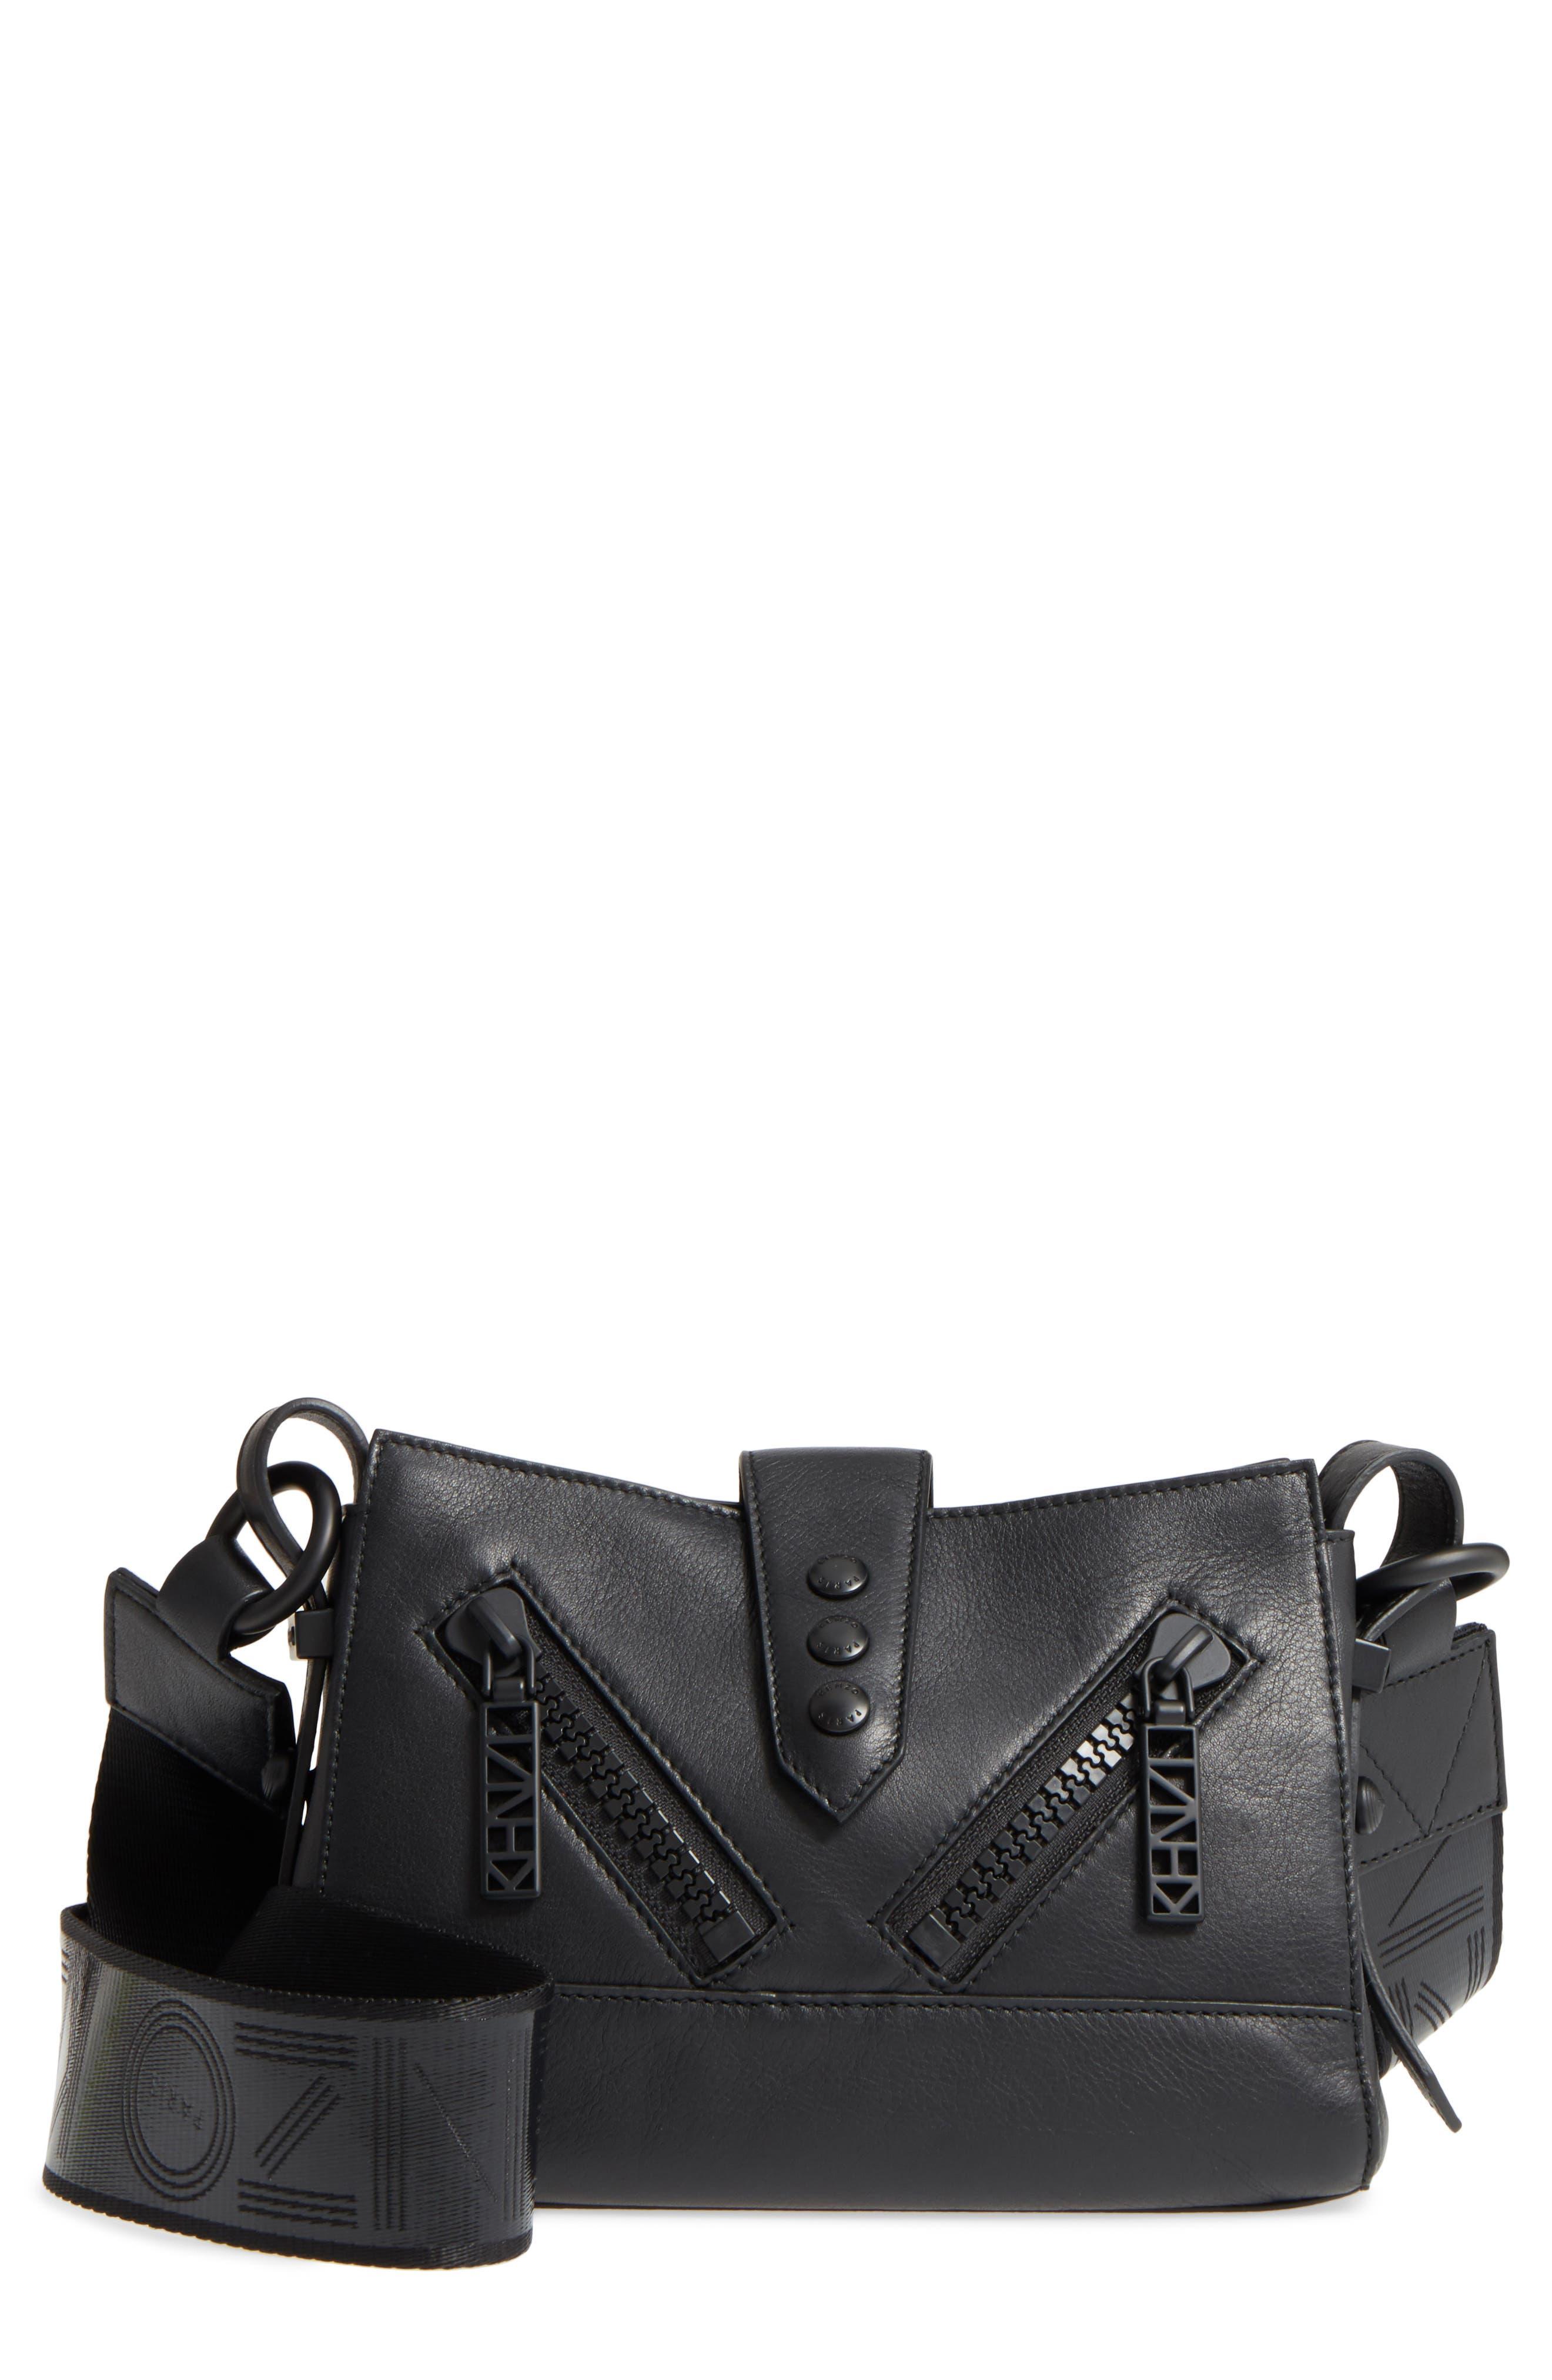 Main Image - KENZO Mini Kalifornia Leather Shoulder Bag